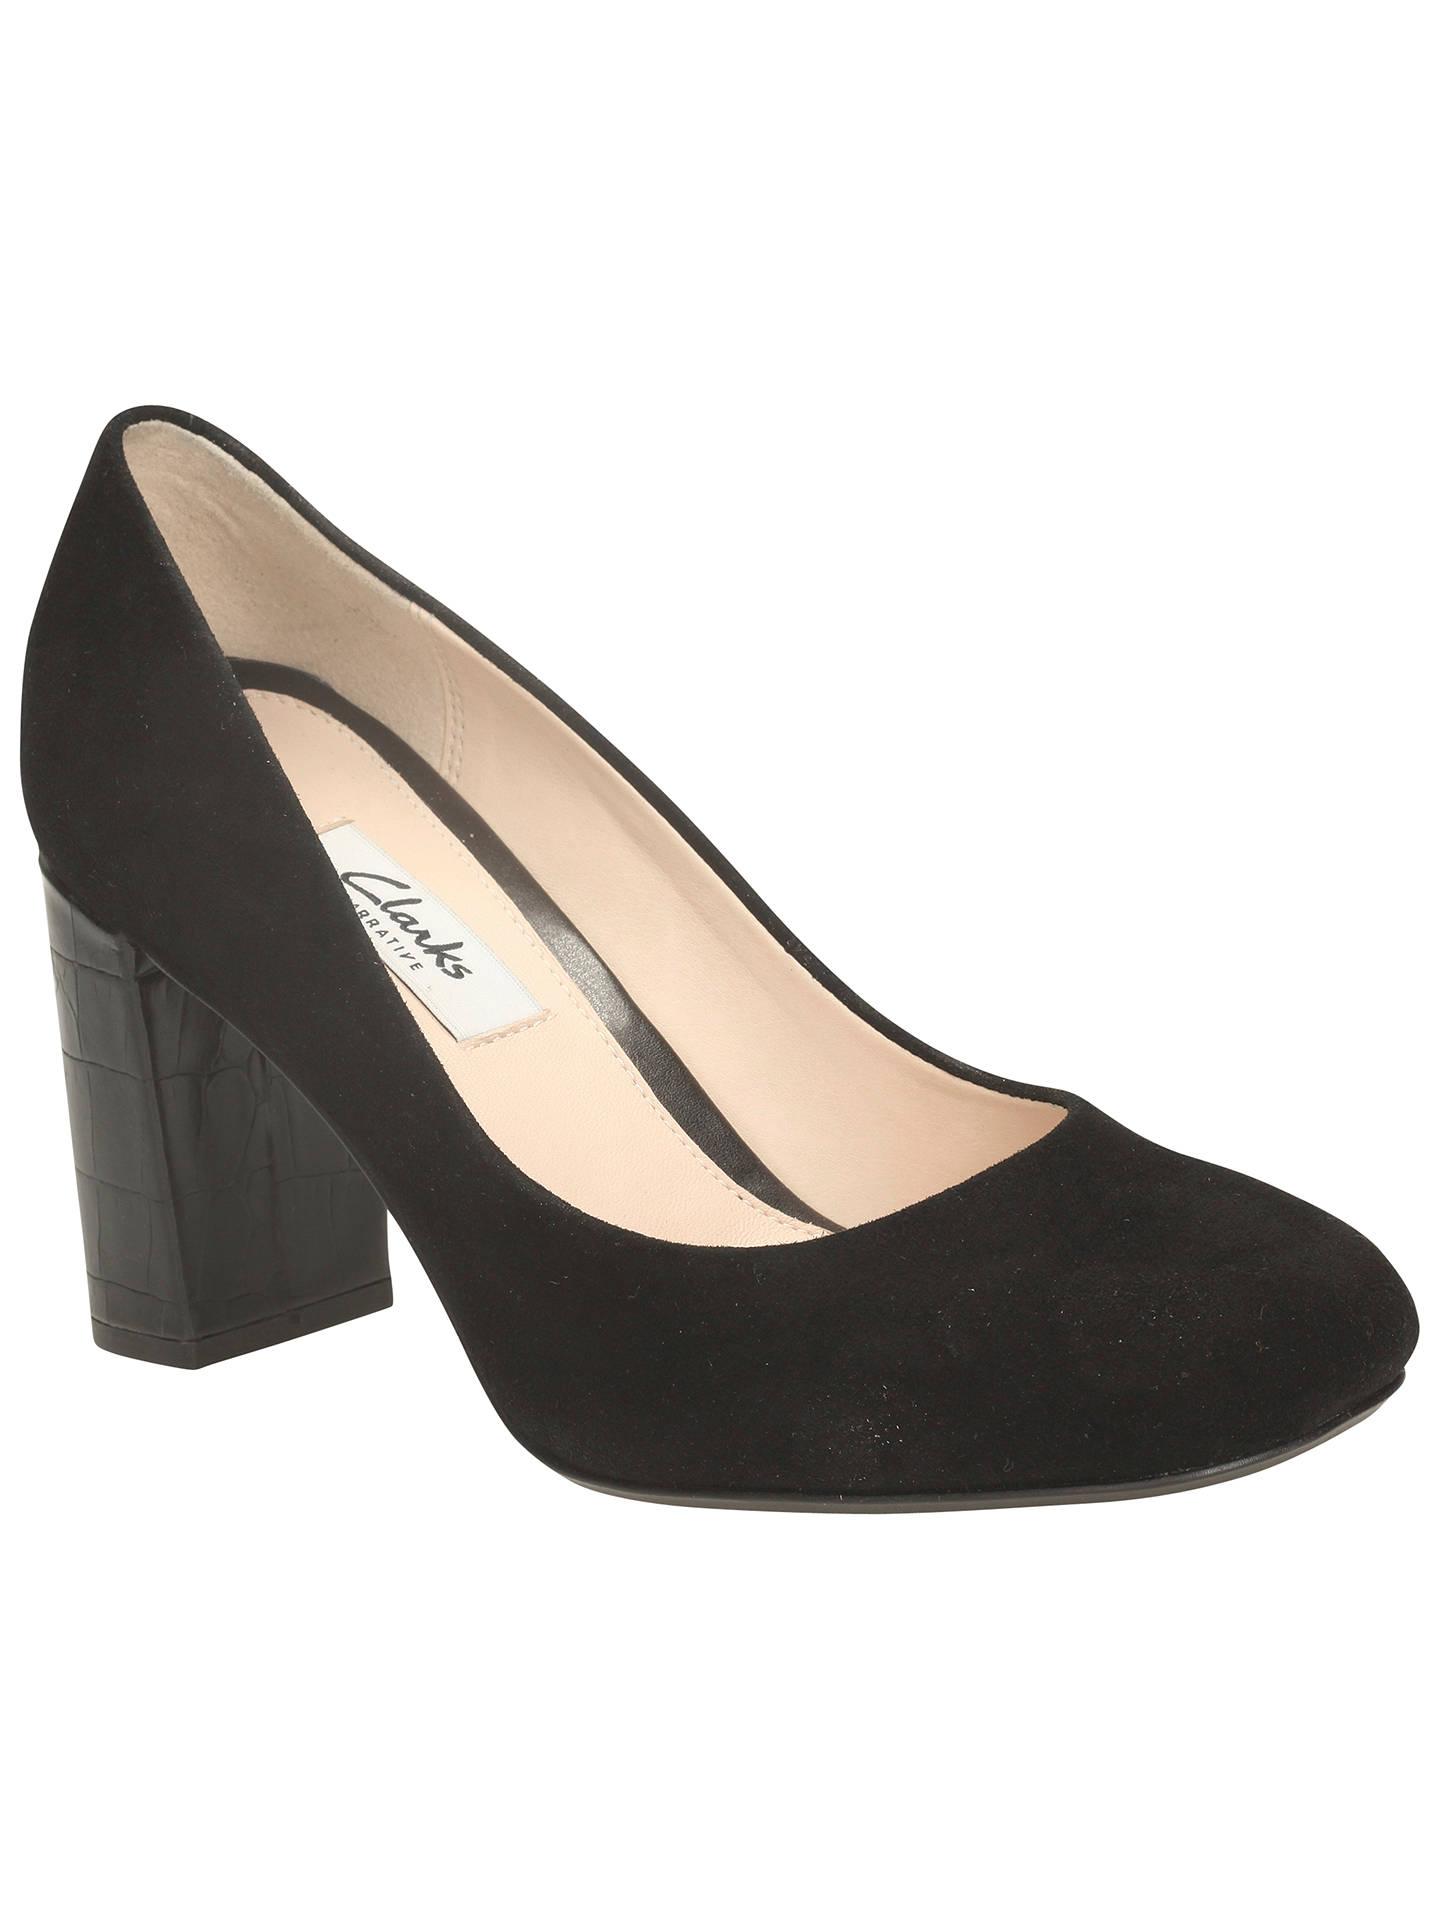 4649e22f Clarks Gabriel Mist Block Heel Court Shoes, Black Suede at John ...